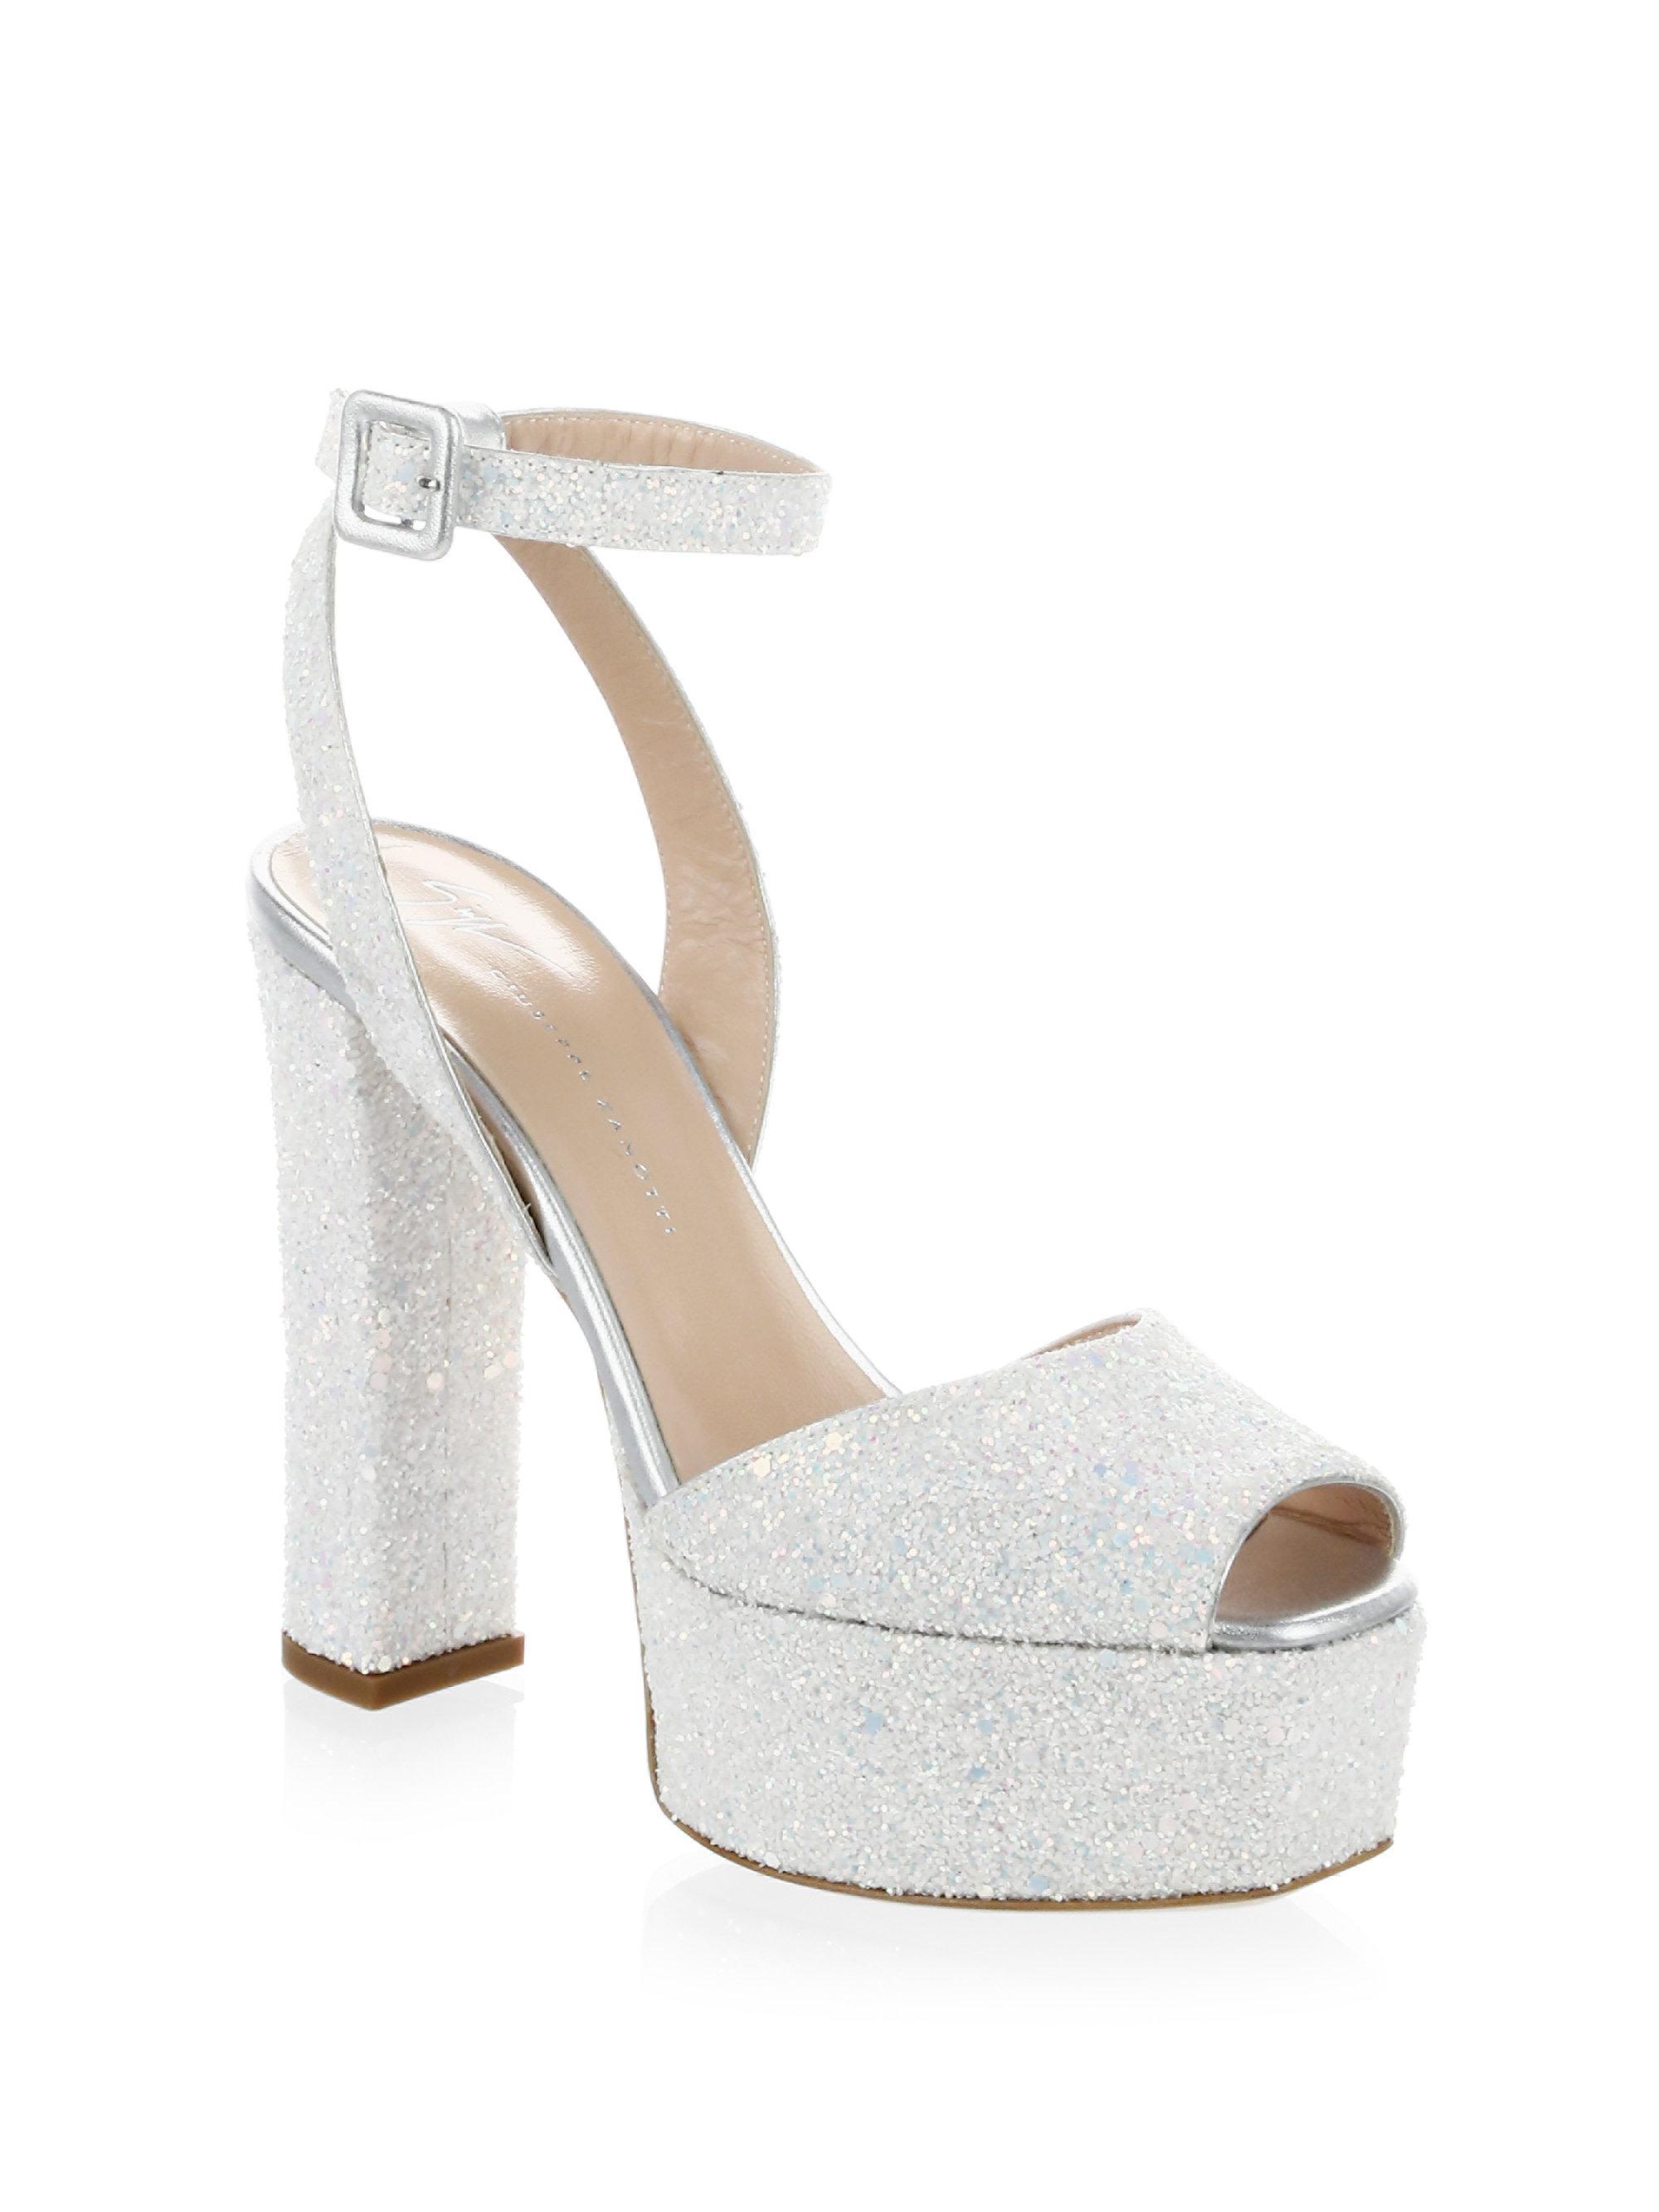 Giuseppe Zanotti Lavinia Glitter Leather Platform Sandals s9wQa